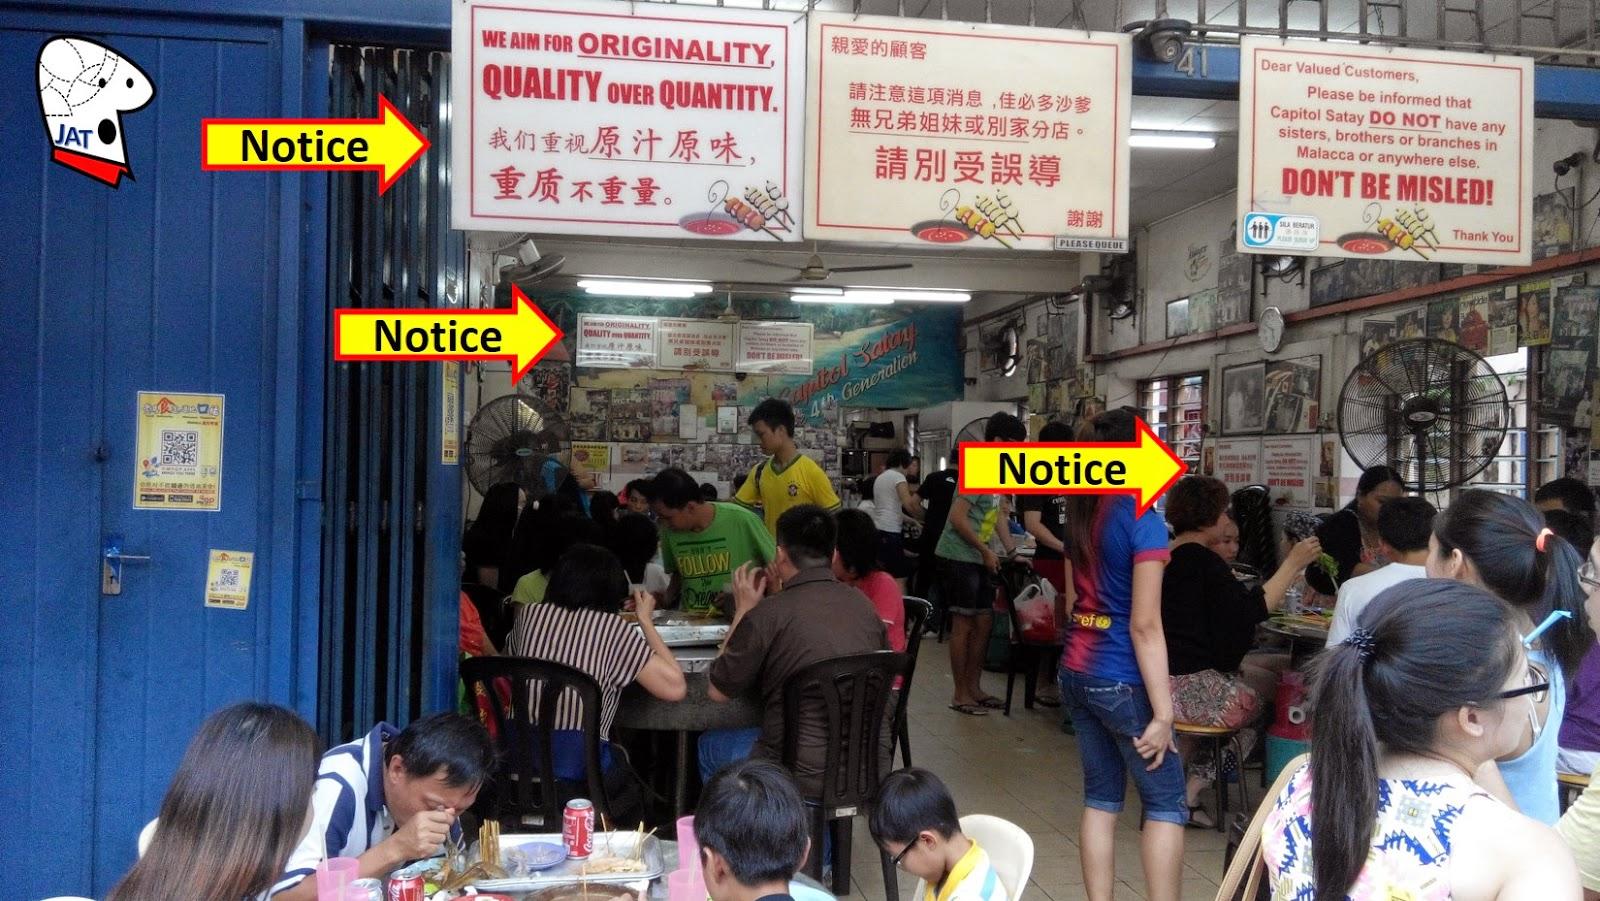 Restoran Capitol Satay - disclaimers.